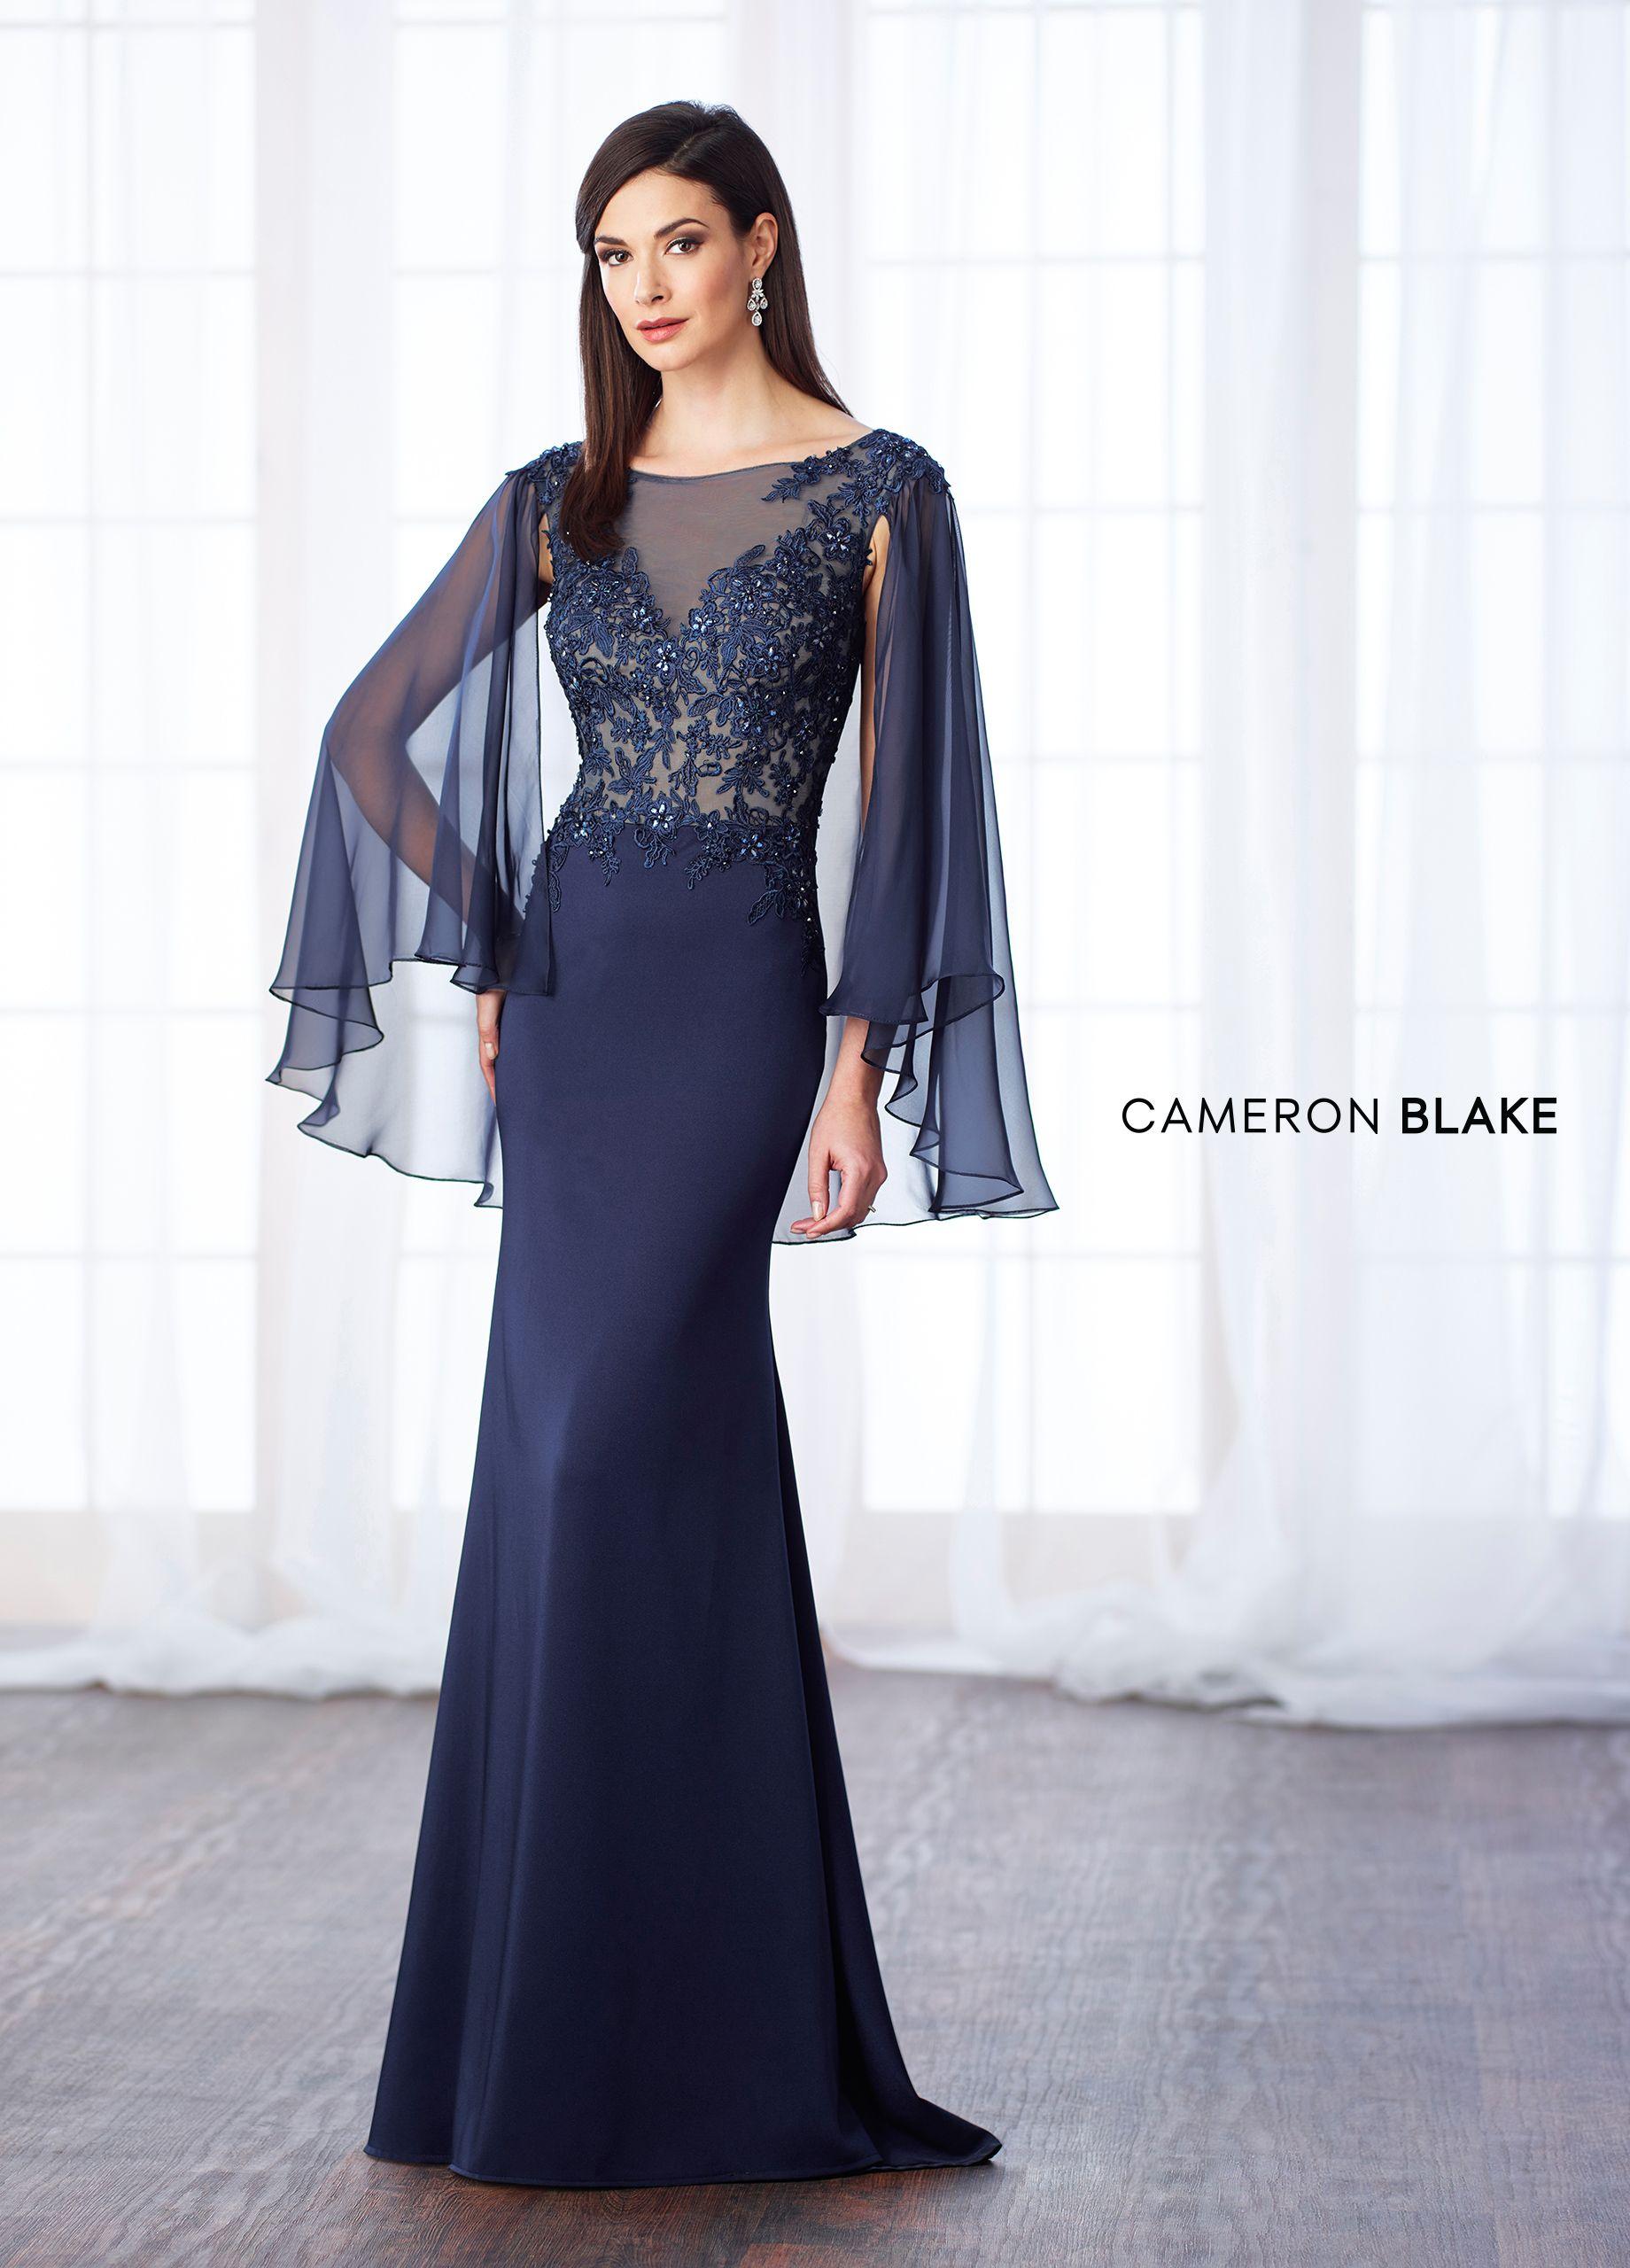 Cameron blake mother of the bride dresses u dress suits